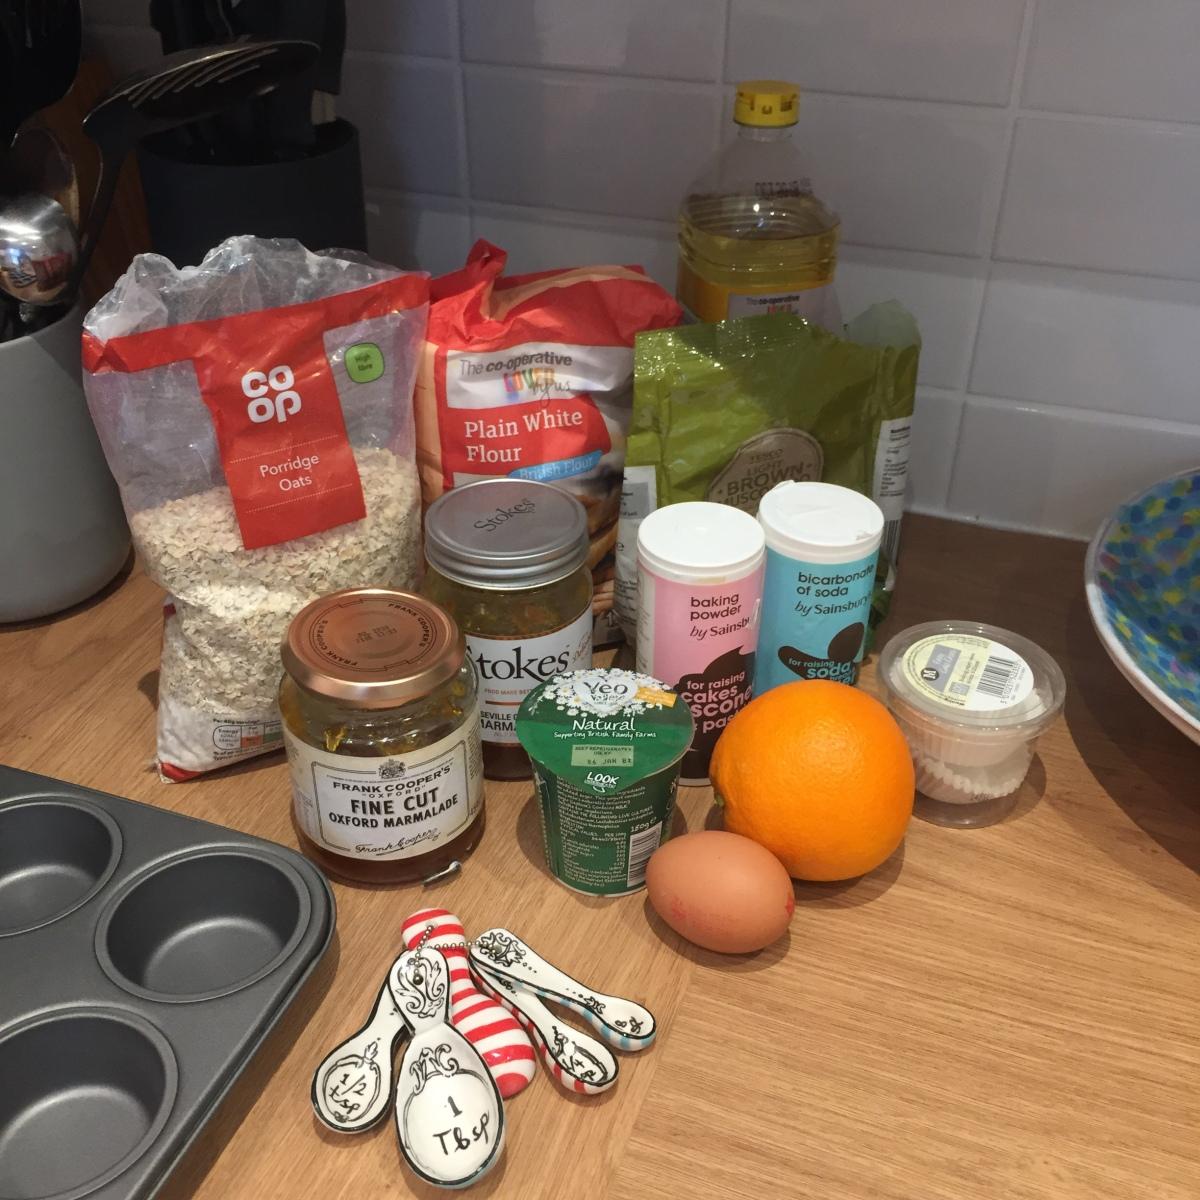 Marmalade muffins ingredients